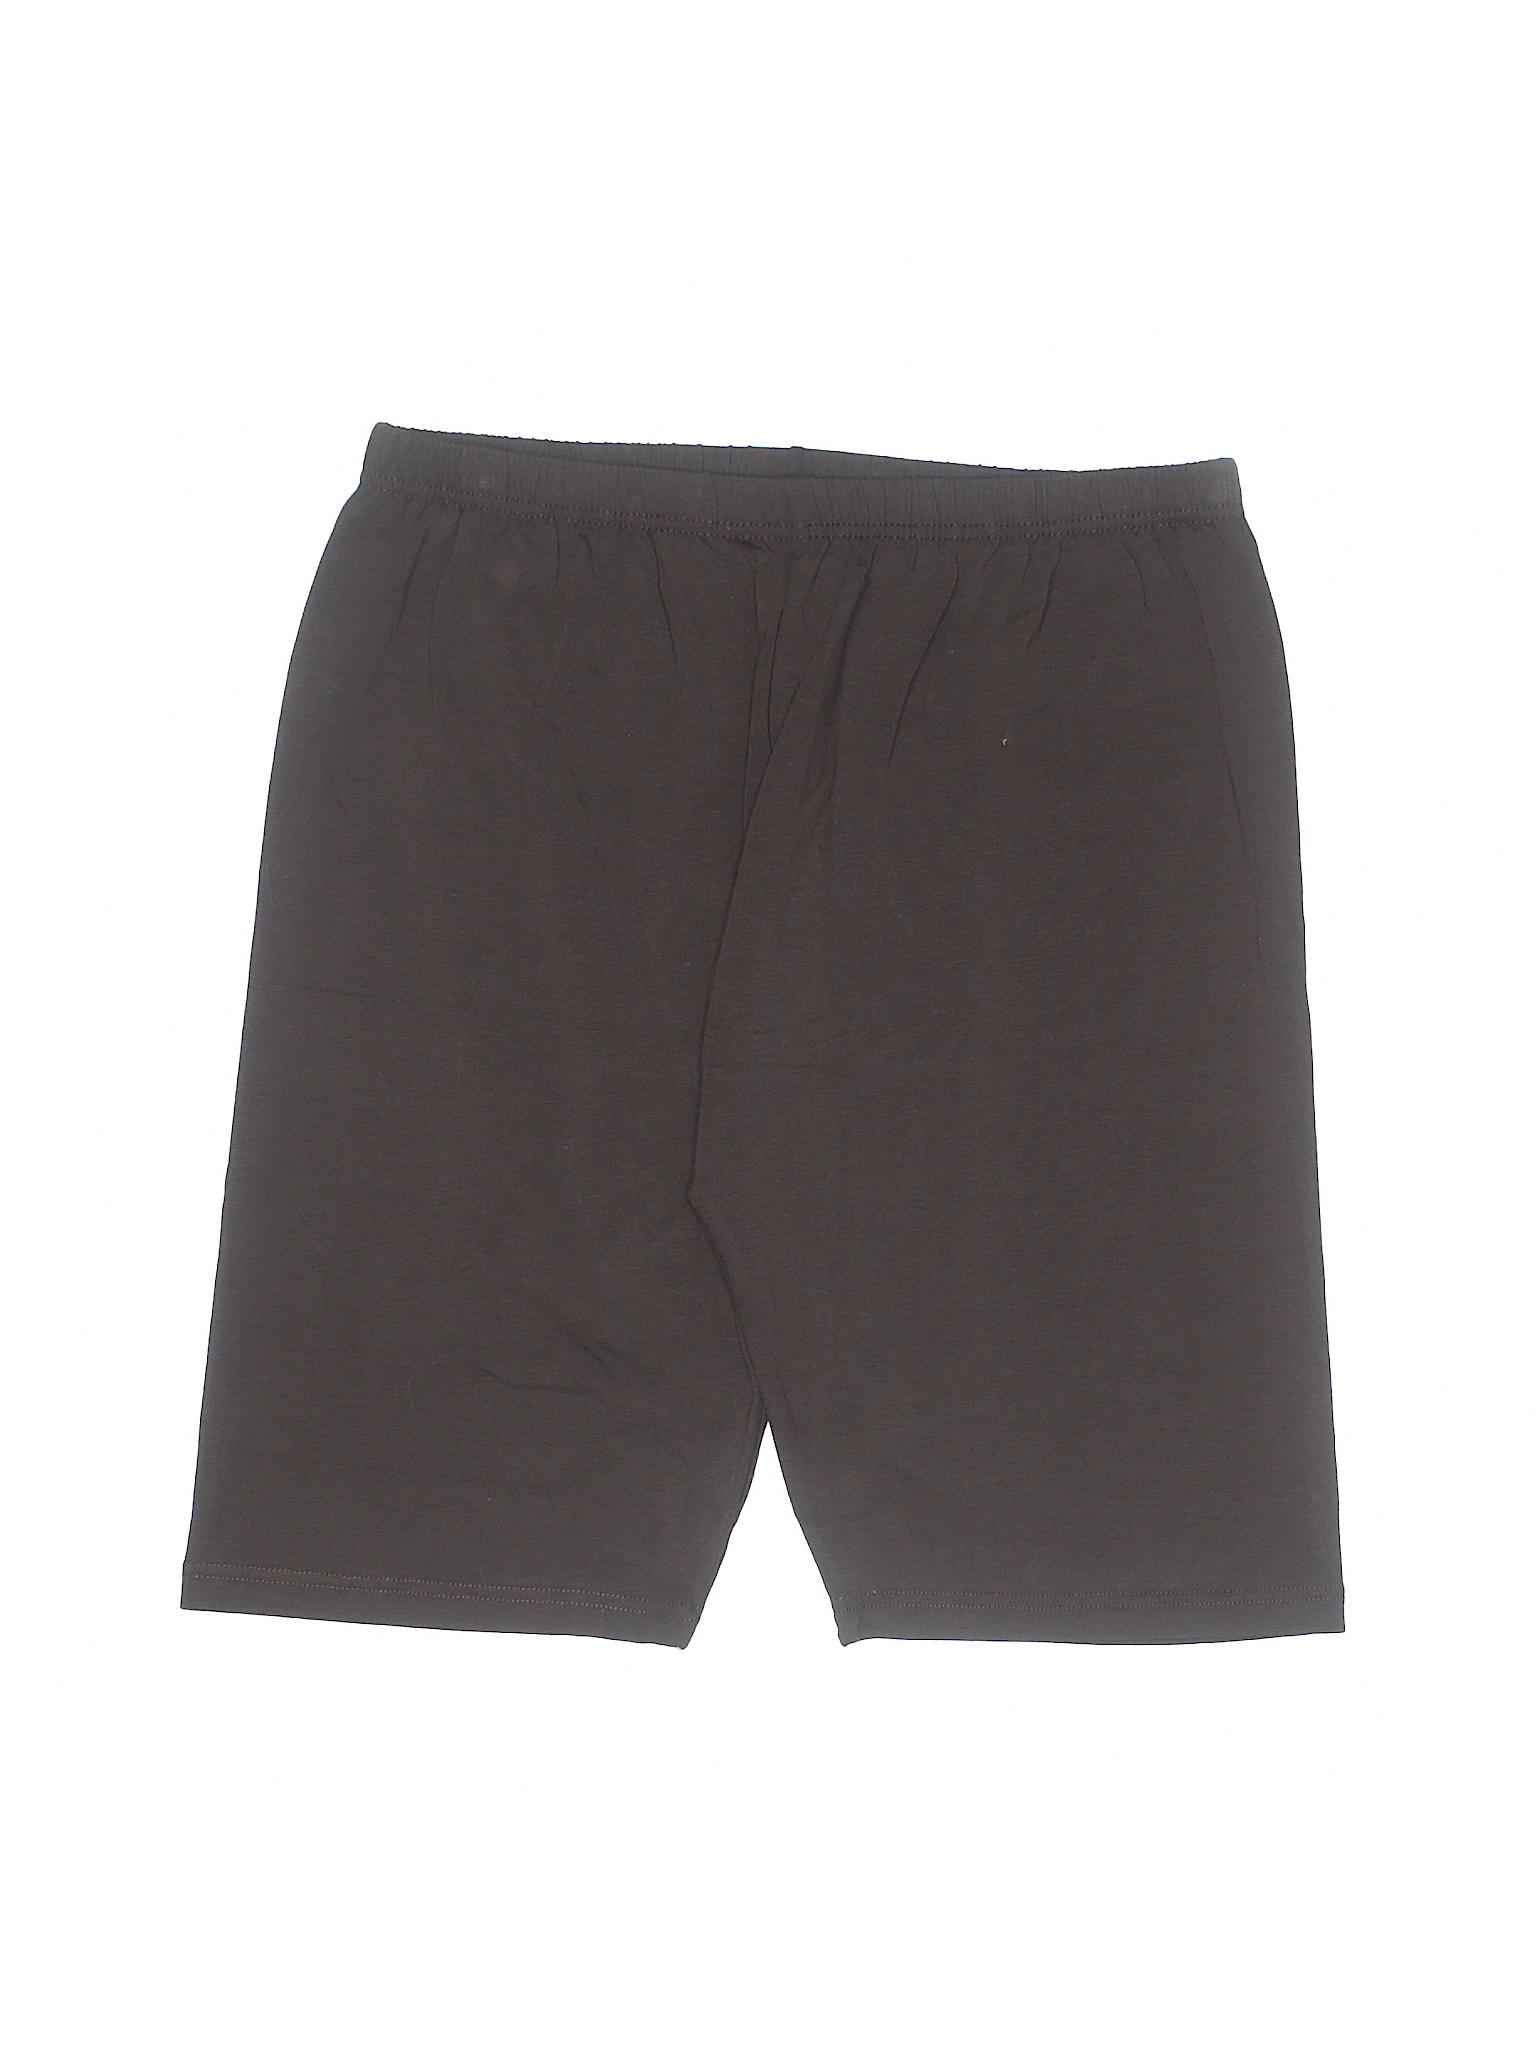 Leisure Elegance Shorts winter Leisure winter O5x7RwW8